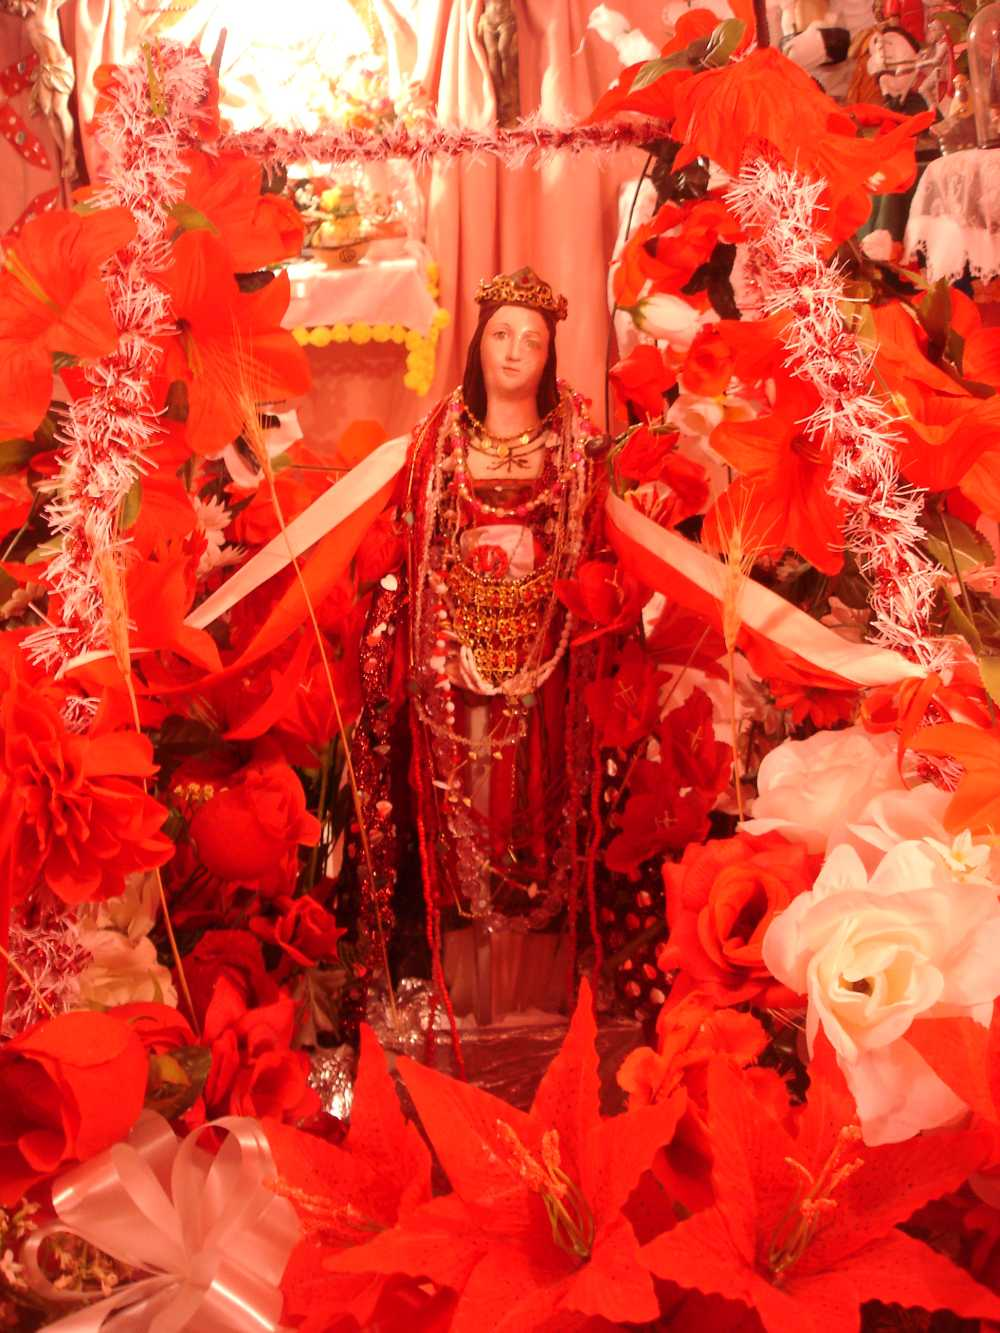 Shrine for Iansa/St. Barbara in Rio Vermelho